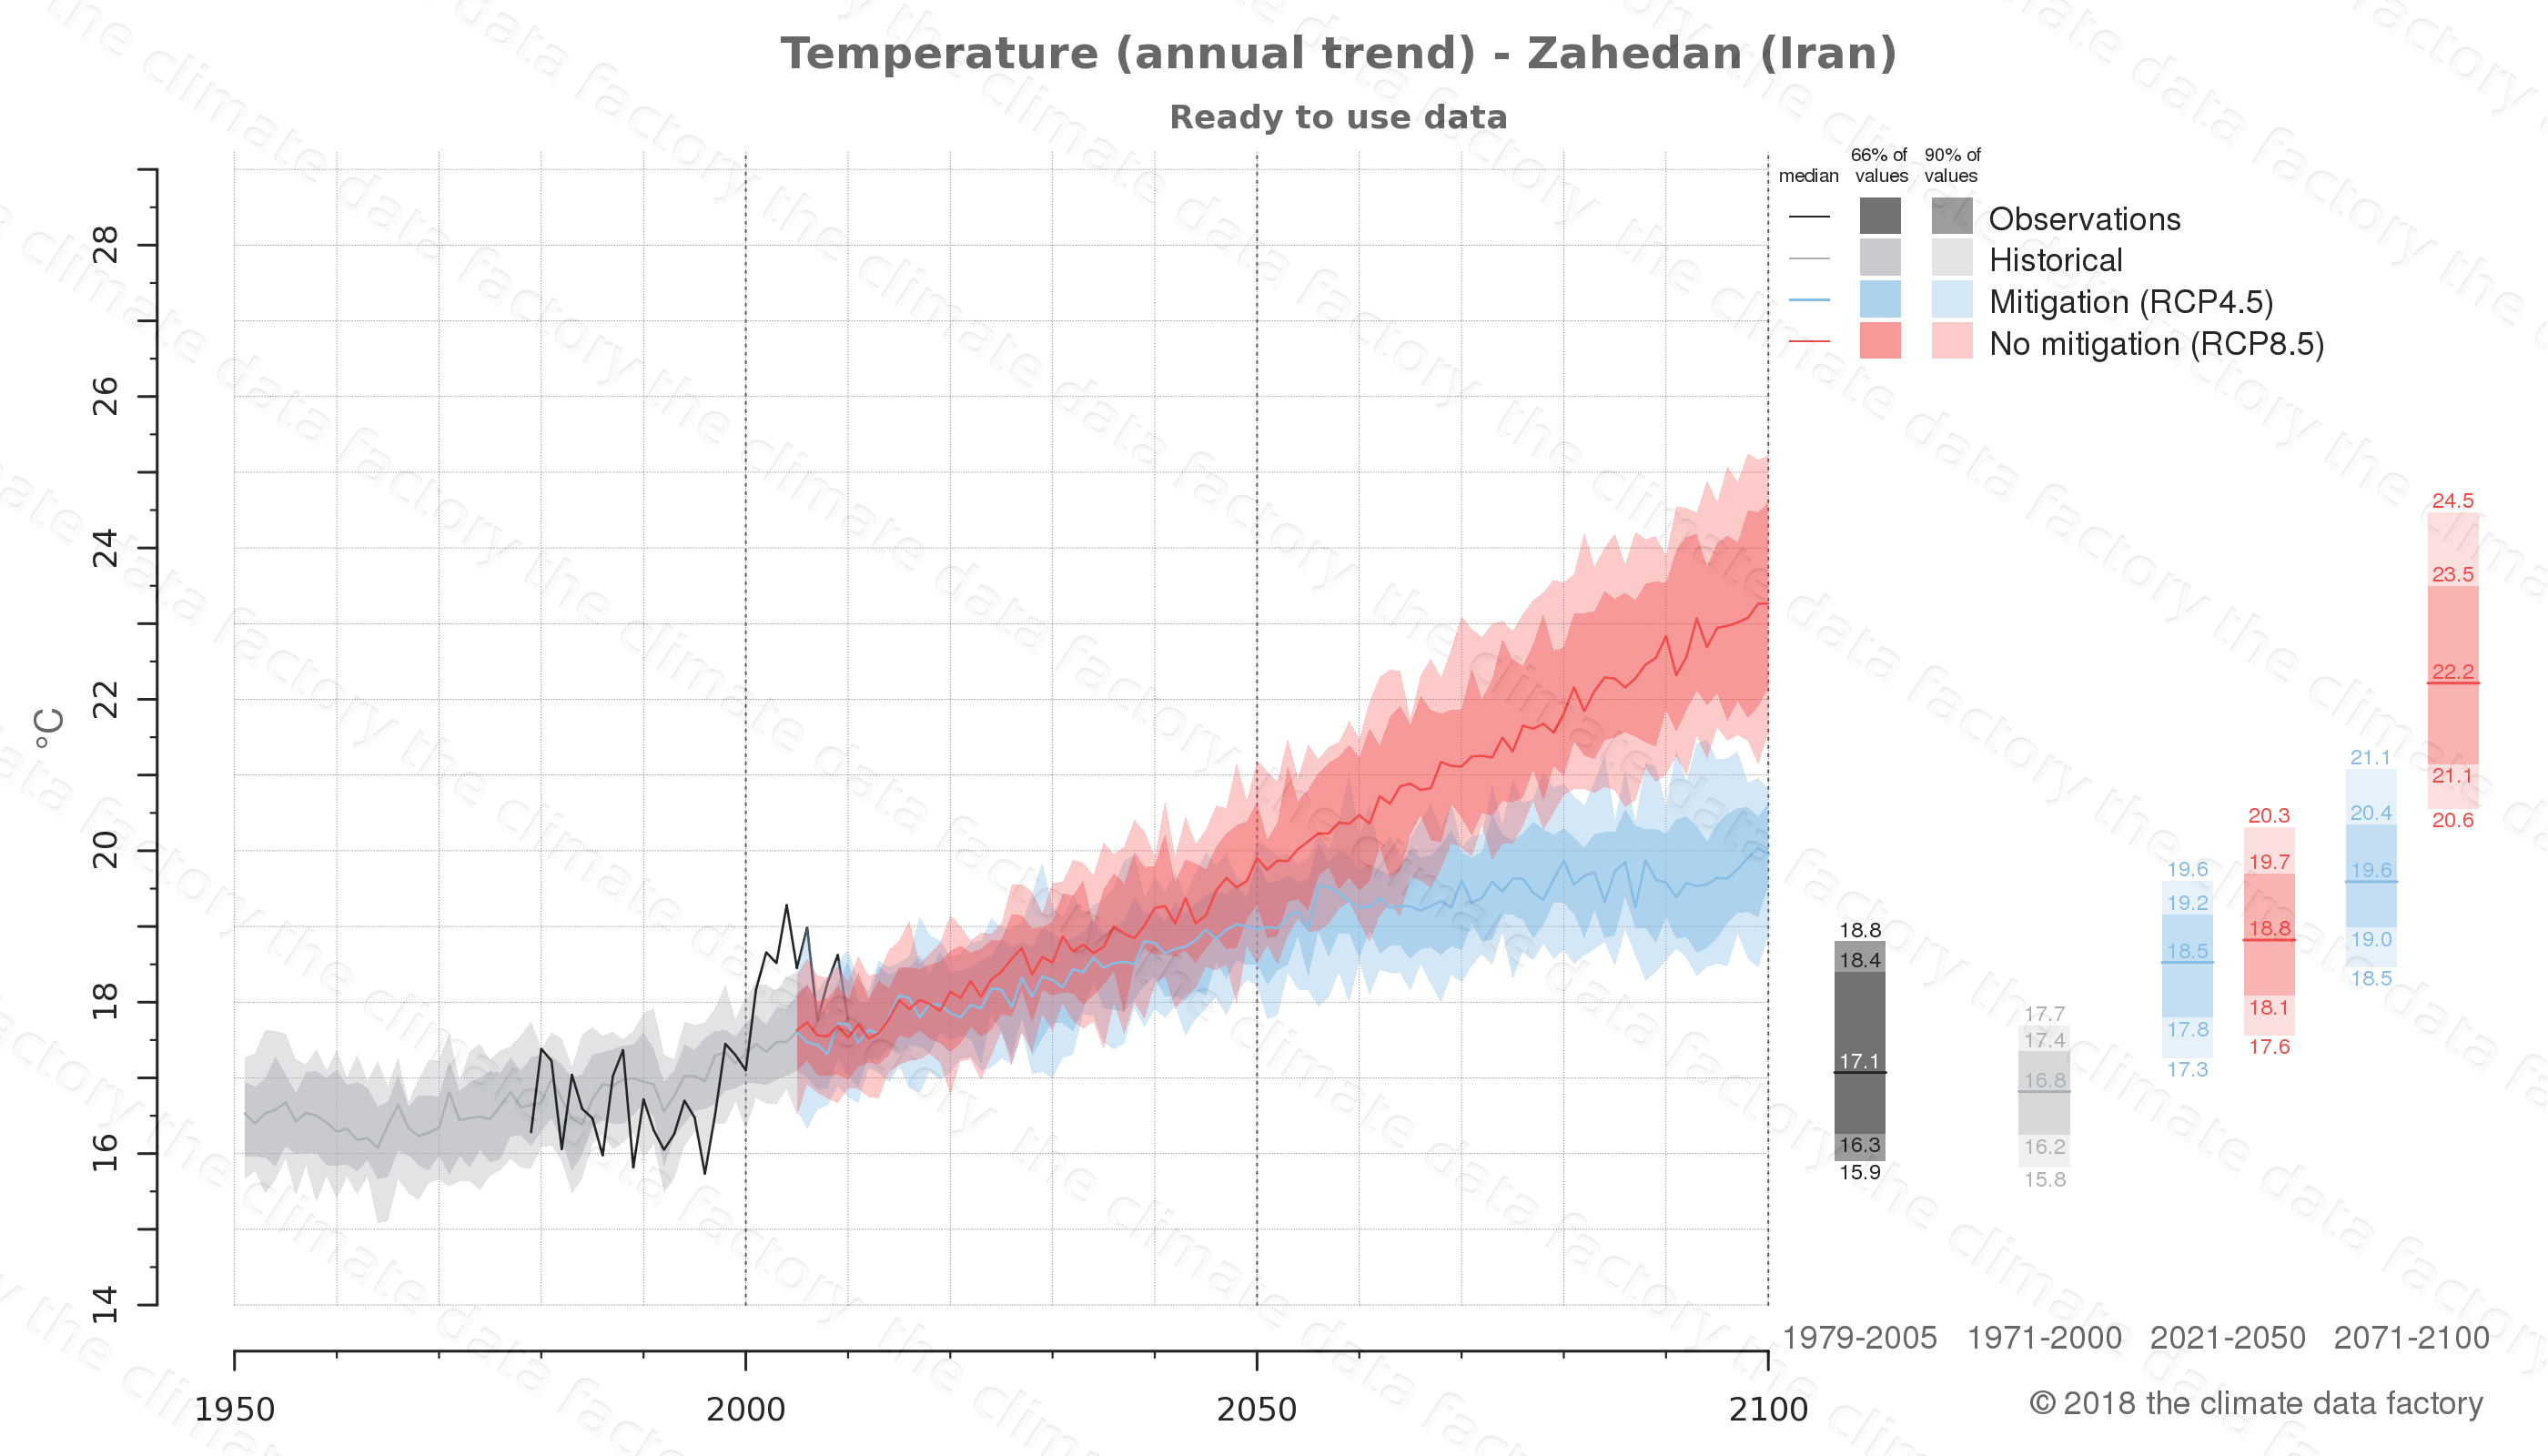 climate change data policy adaptation climate graph city data temperature zahedan iran